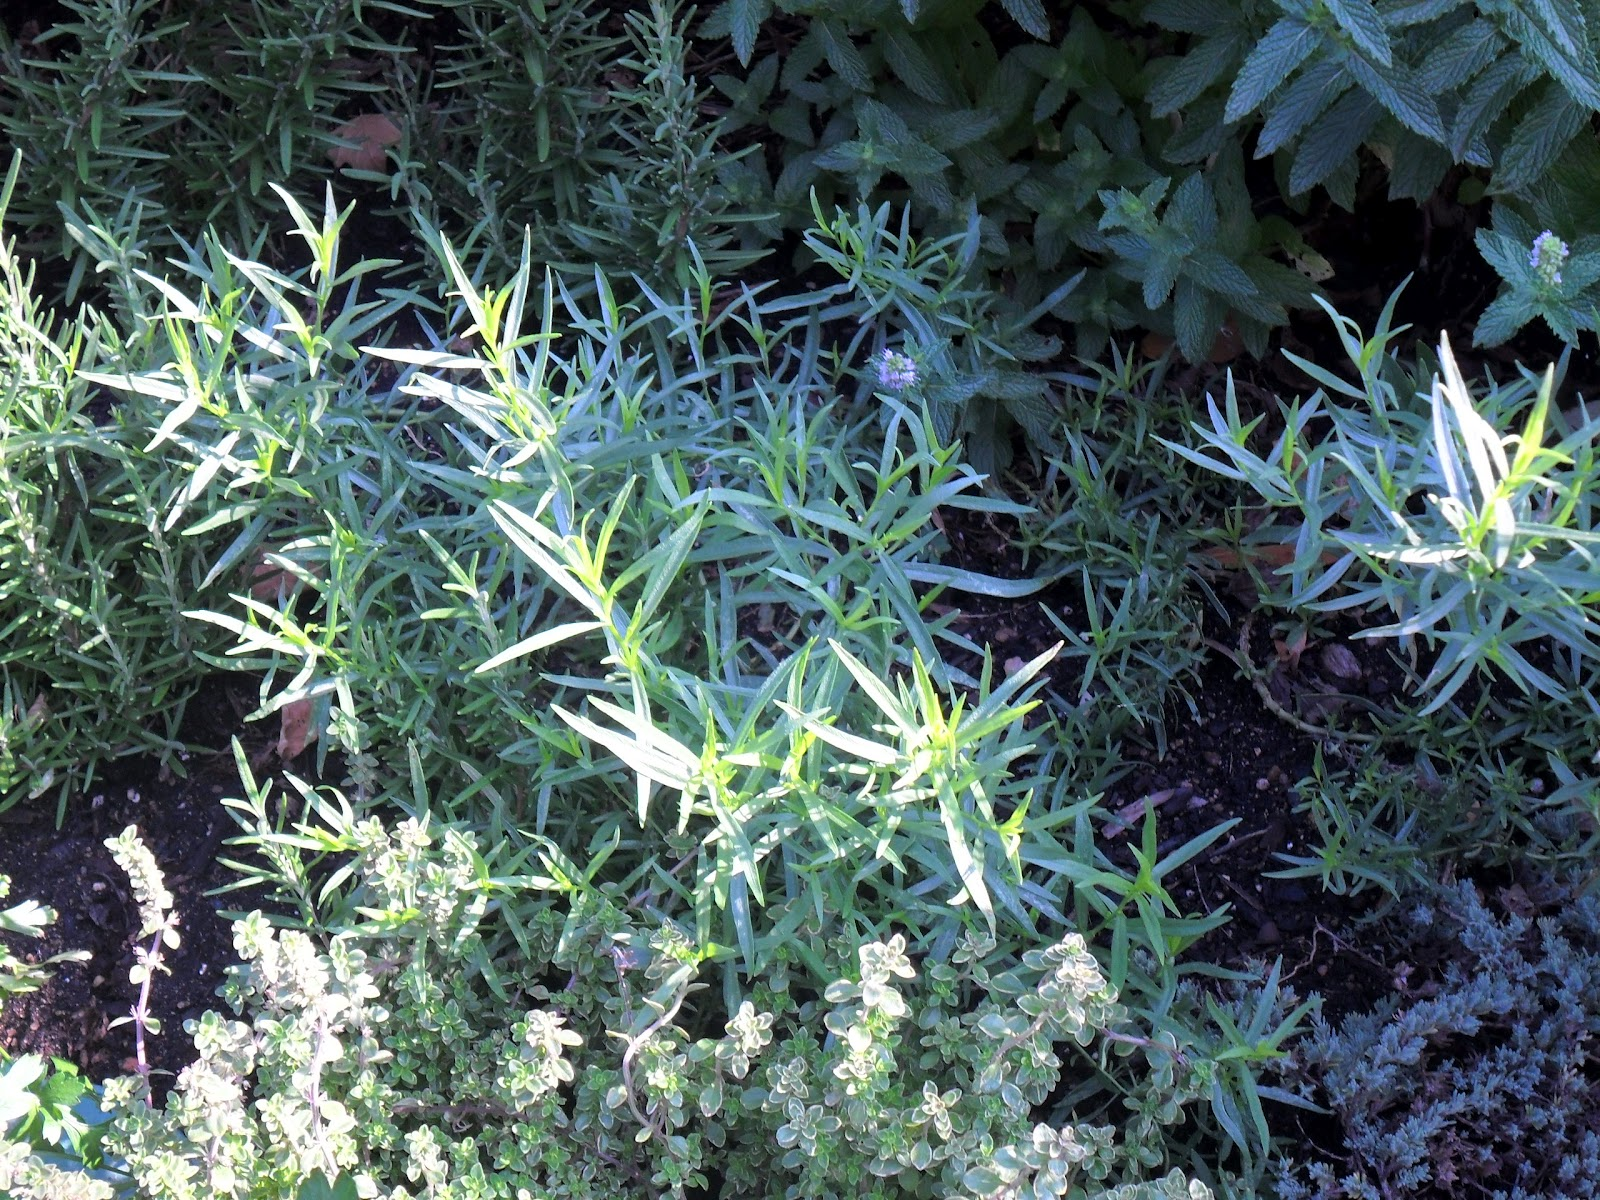 Backyard Patch Herbal Blog: Herb Garden Event - Chicago Botanic Gardens